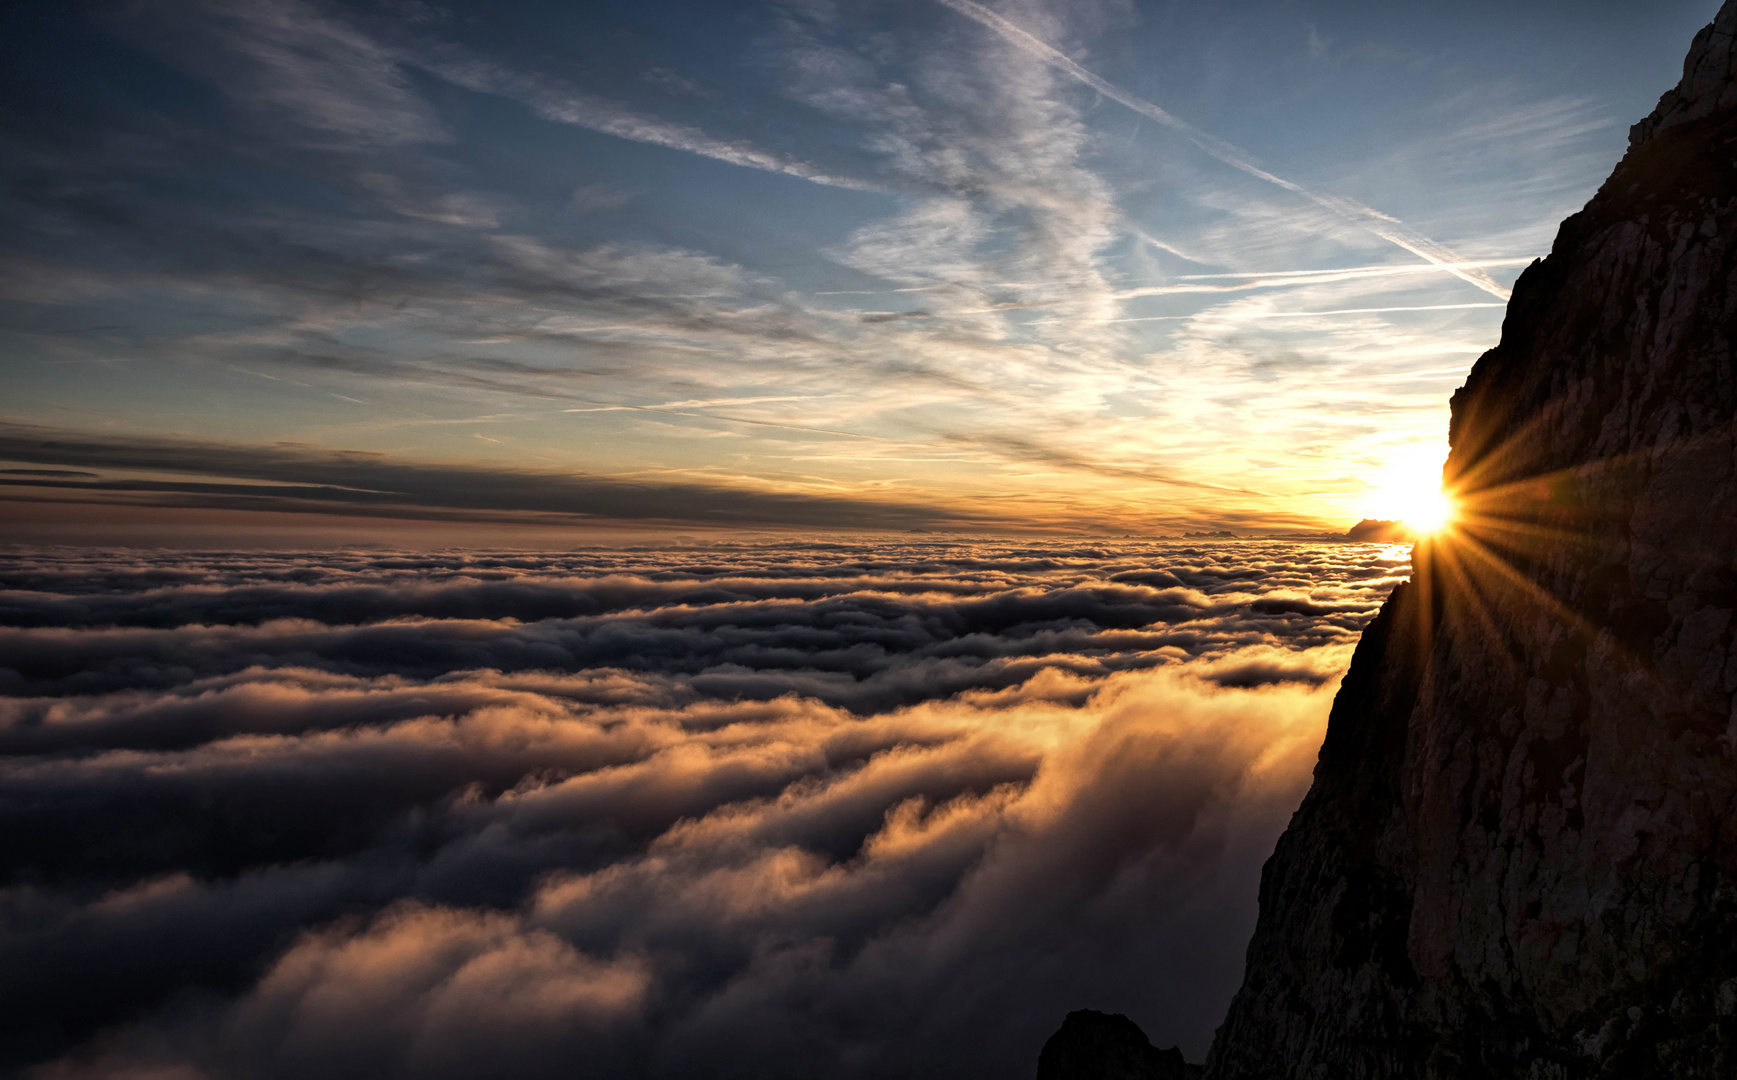 Faszination Berge - Sonnenaufgang auf dem Pilatus